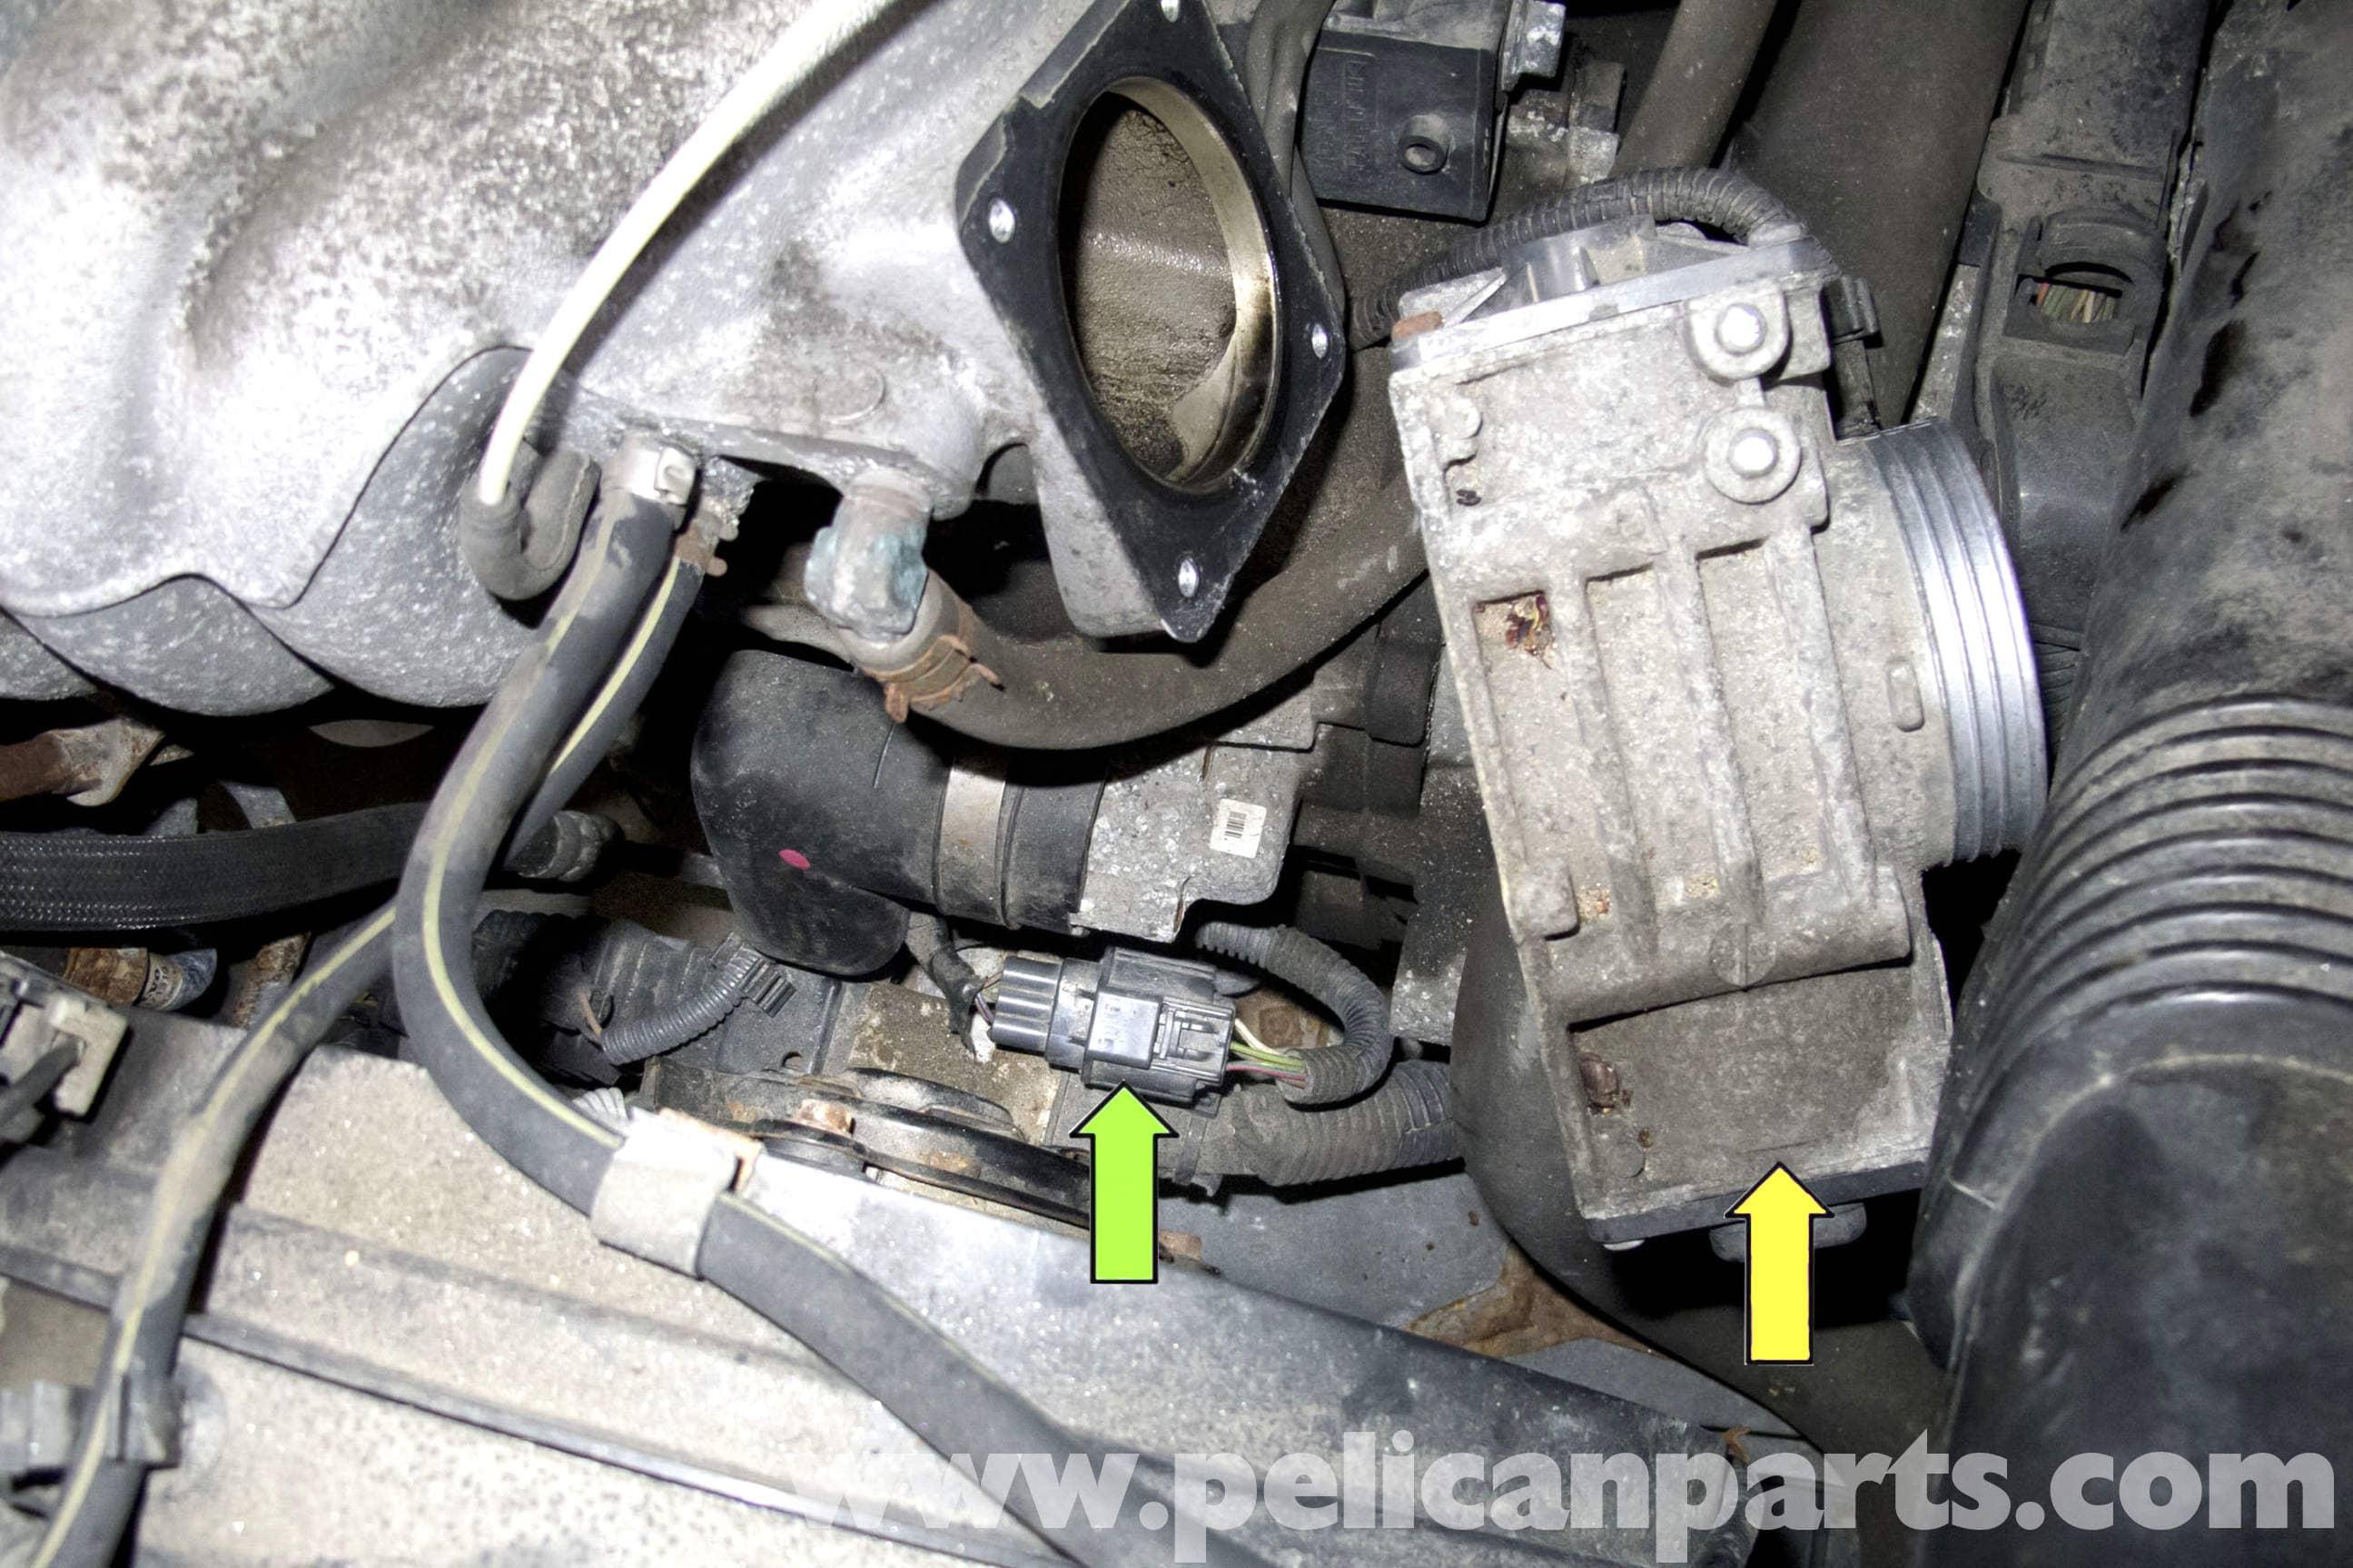 2006 Volvo Xc90 Wiring Diagram Volvo V70 Throttle Housing Replacement 1998 2007